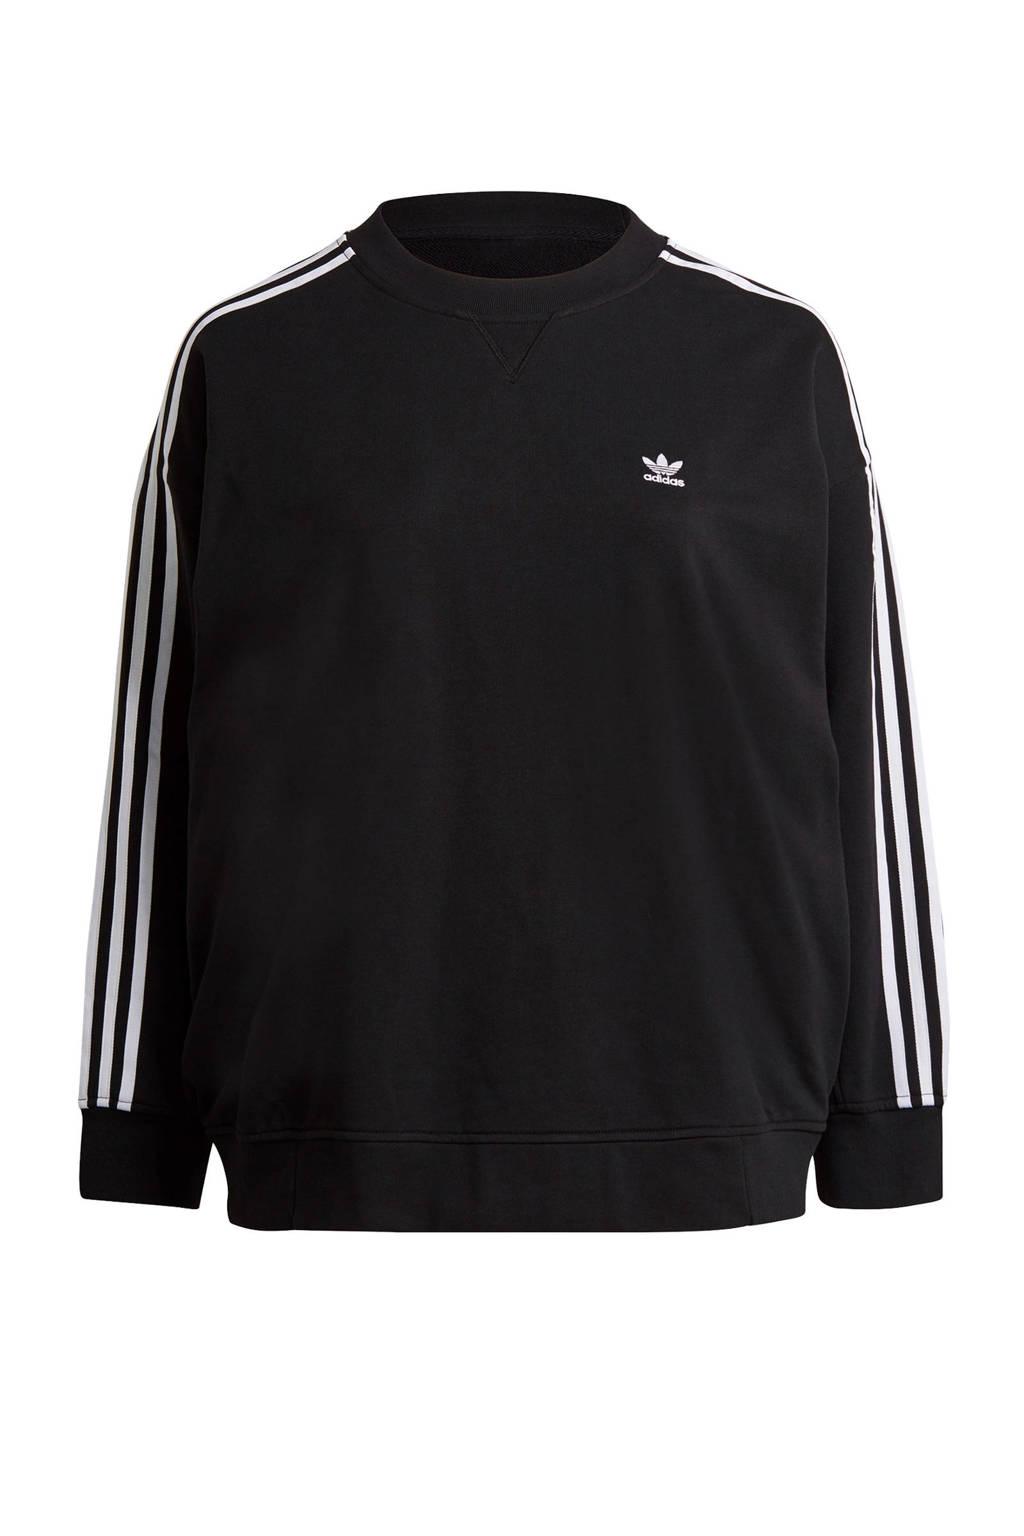 adidas Originals Plus Size Adicolor sweater zwart/wit, Zwart/wit